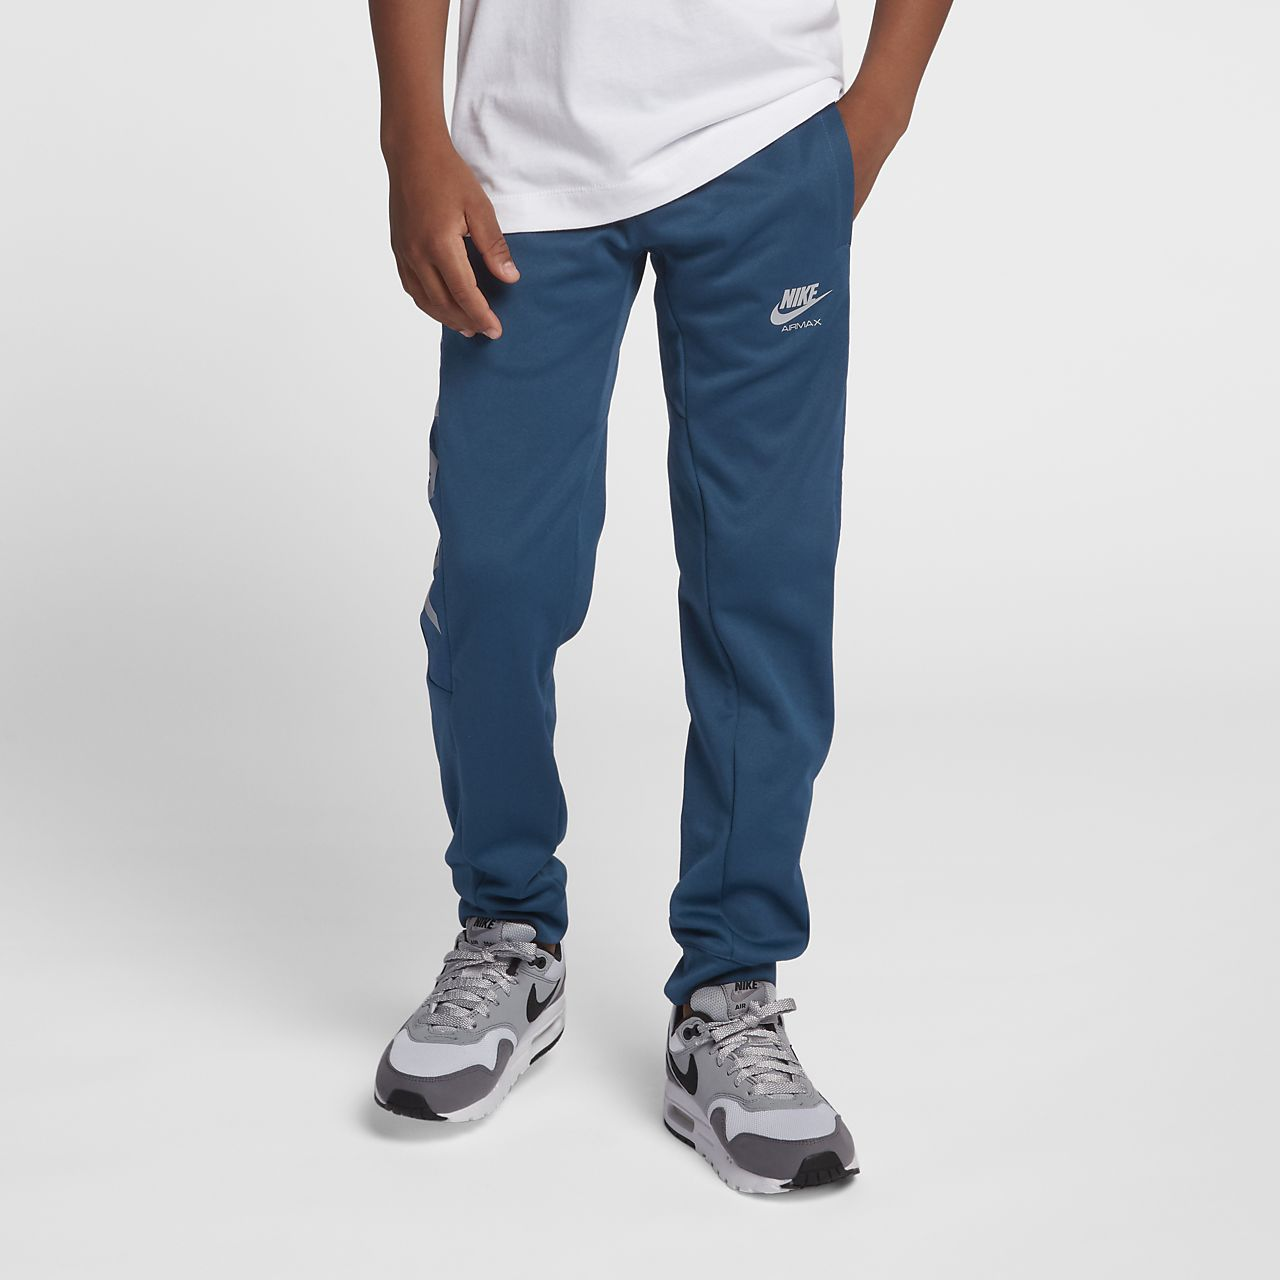 1cbb40df0d9 Pantalon Nike Air Max pour Garçon plus âgé. Nike.com CH